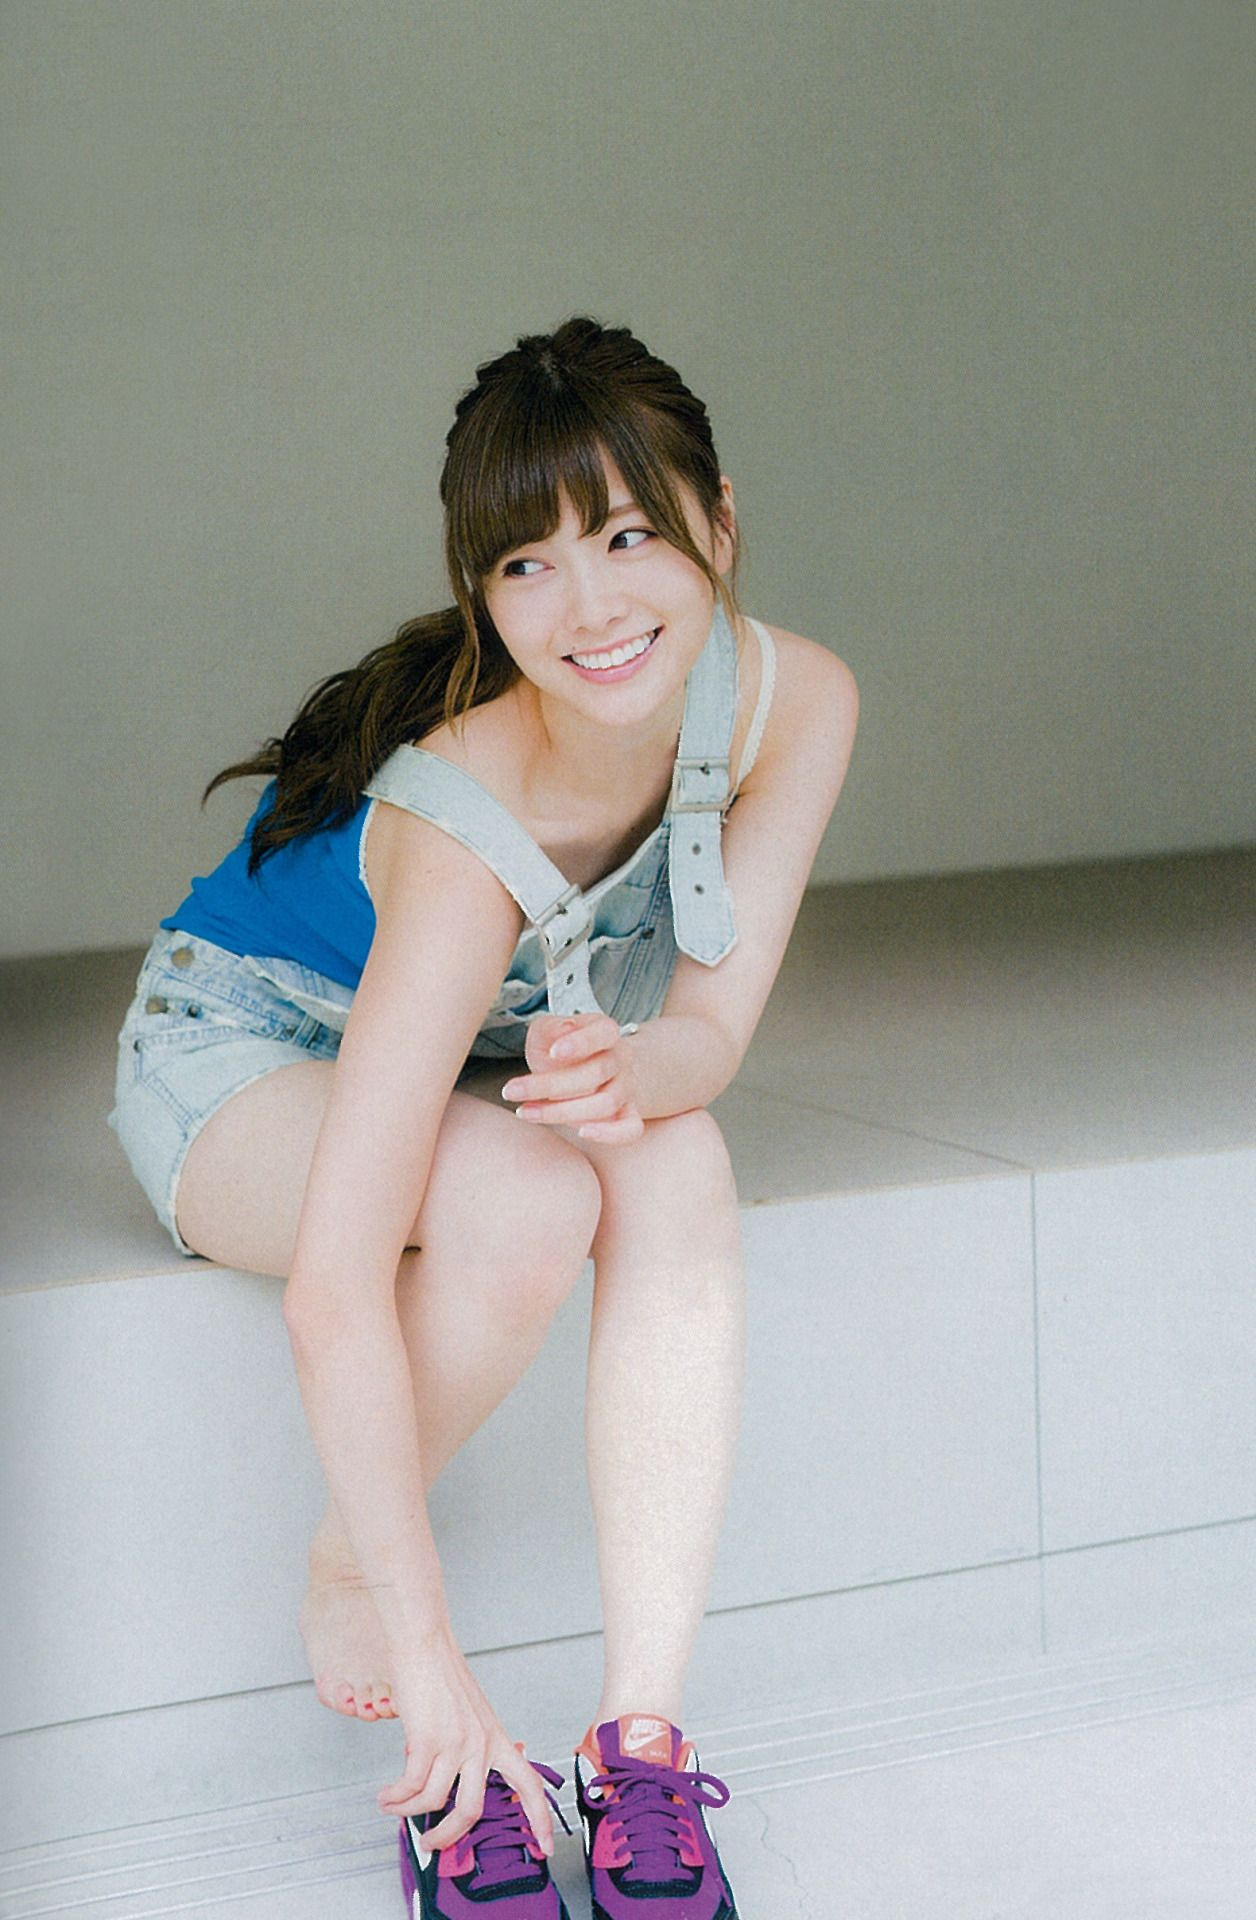 題名未設定 — 46pic: Mai Shiraishi - BCS